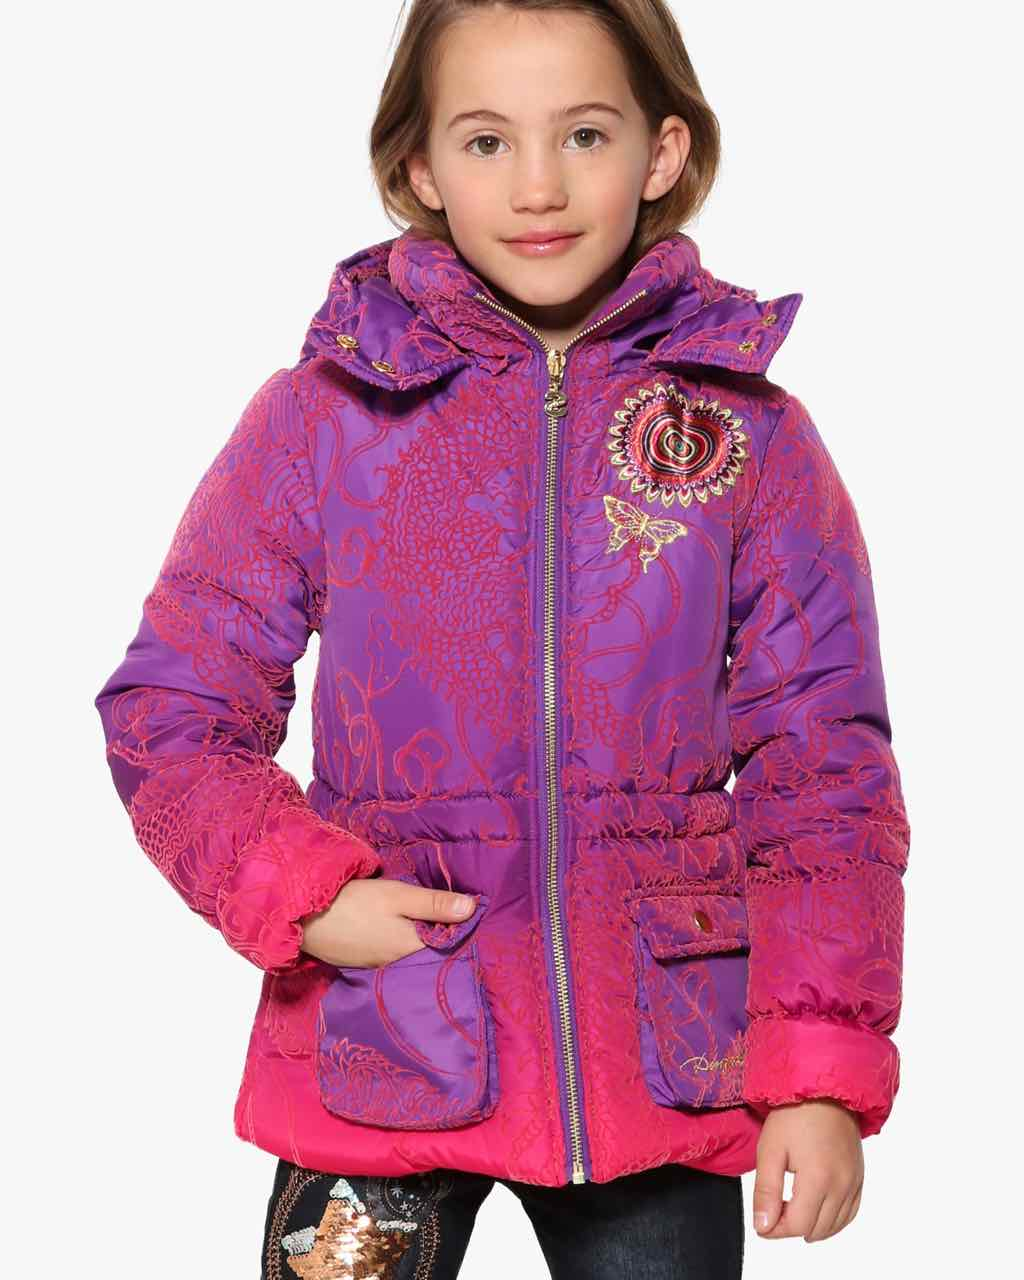 17WGEW29_3125 Desigual Girls Coat Cardedeu Buy Online